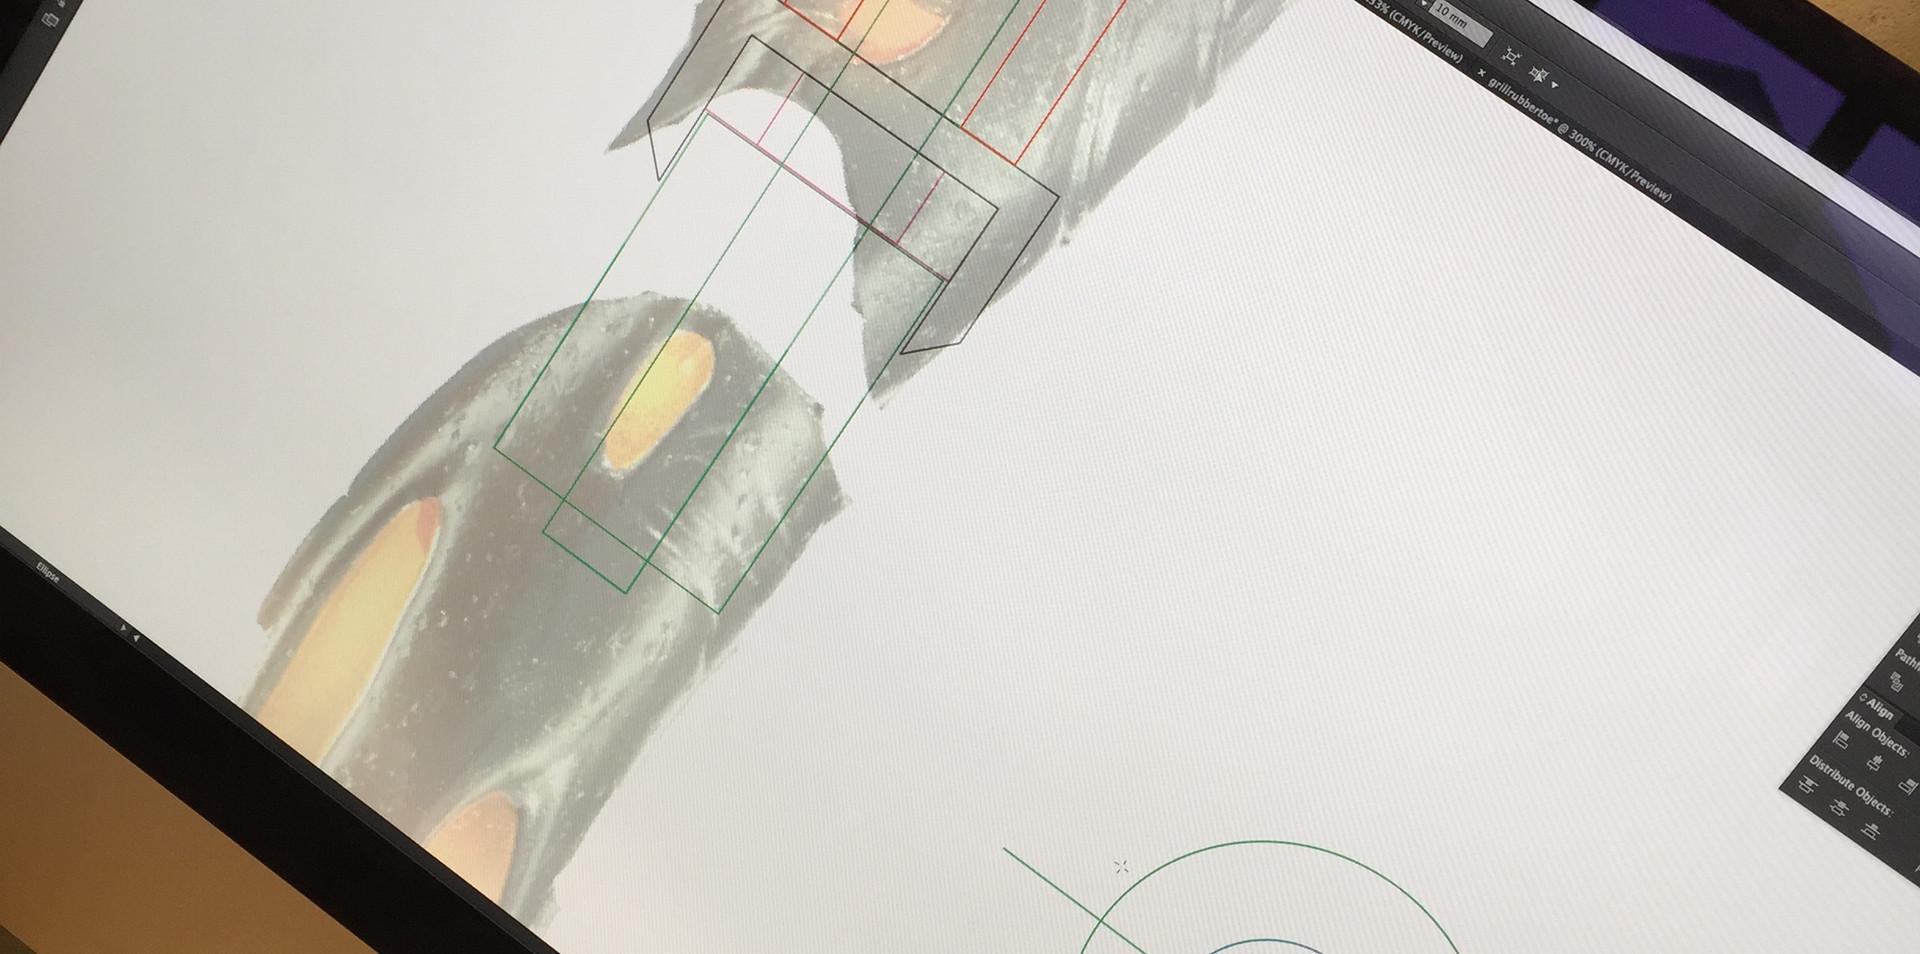 Designing the internal pivot mechanism.